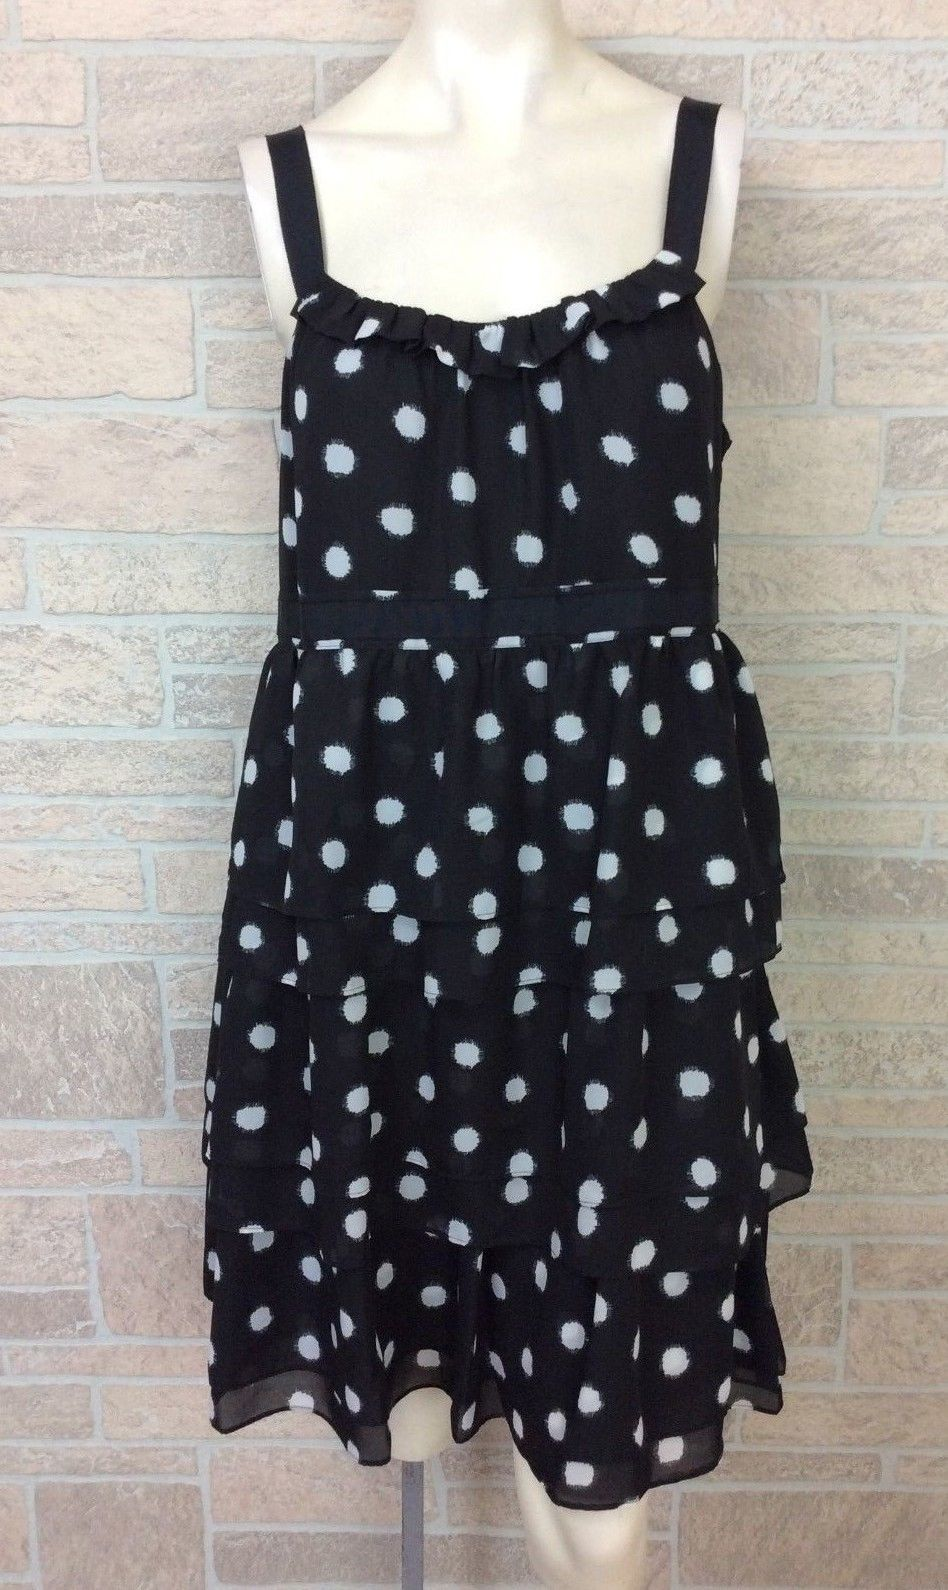 Ann Taylor LOFT Black Polka Dot Petite Crosshatch Cot Print Tiered Dress Size 14